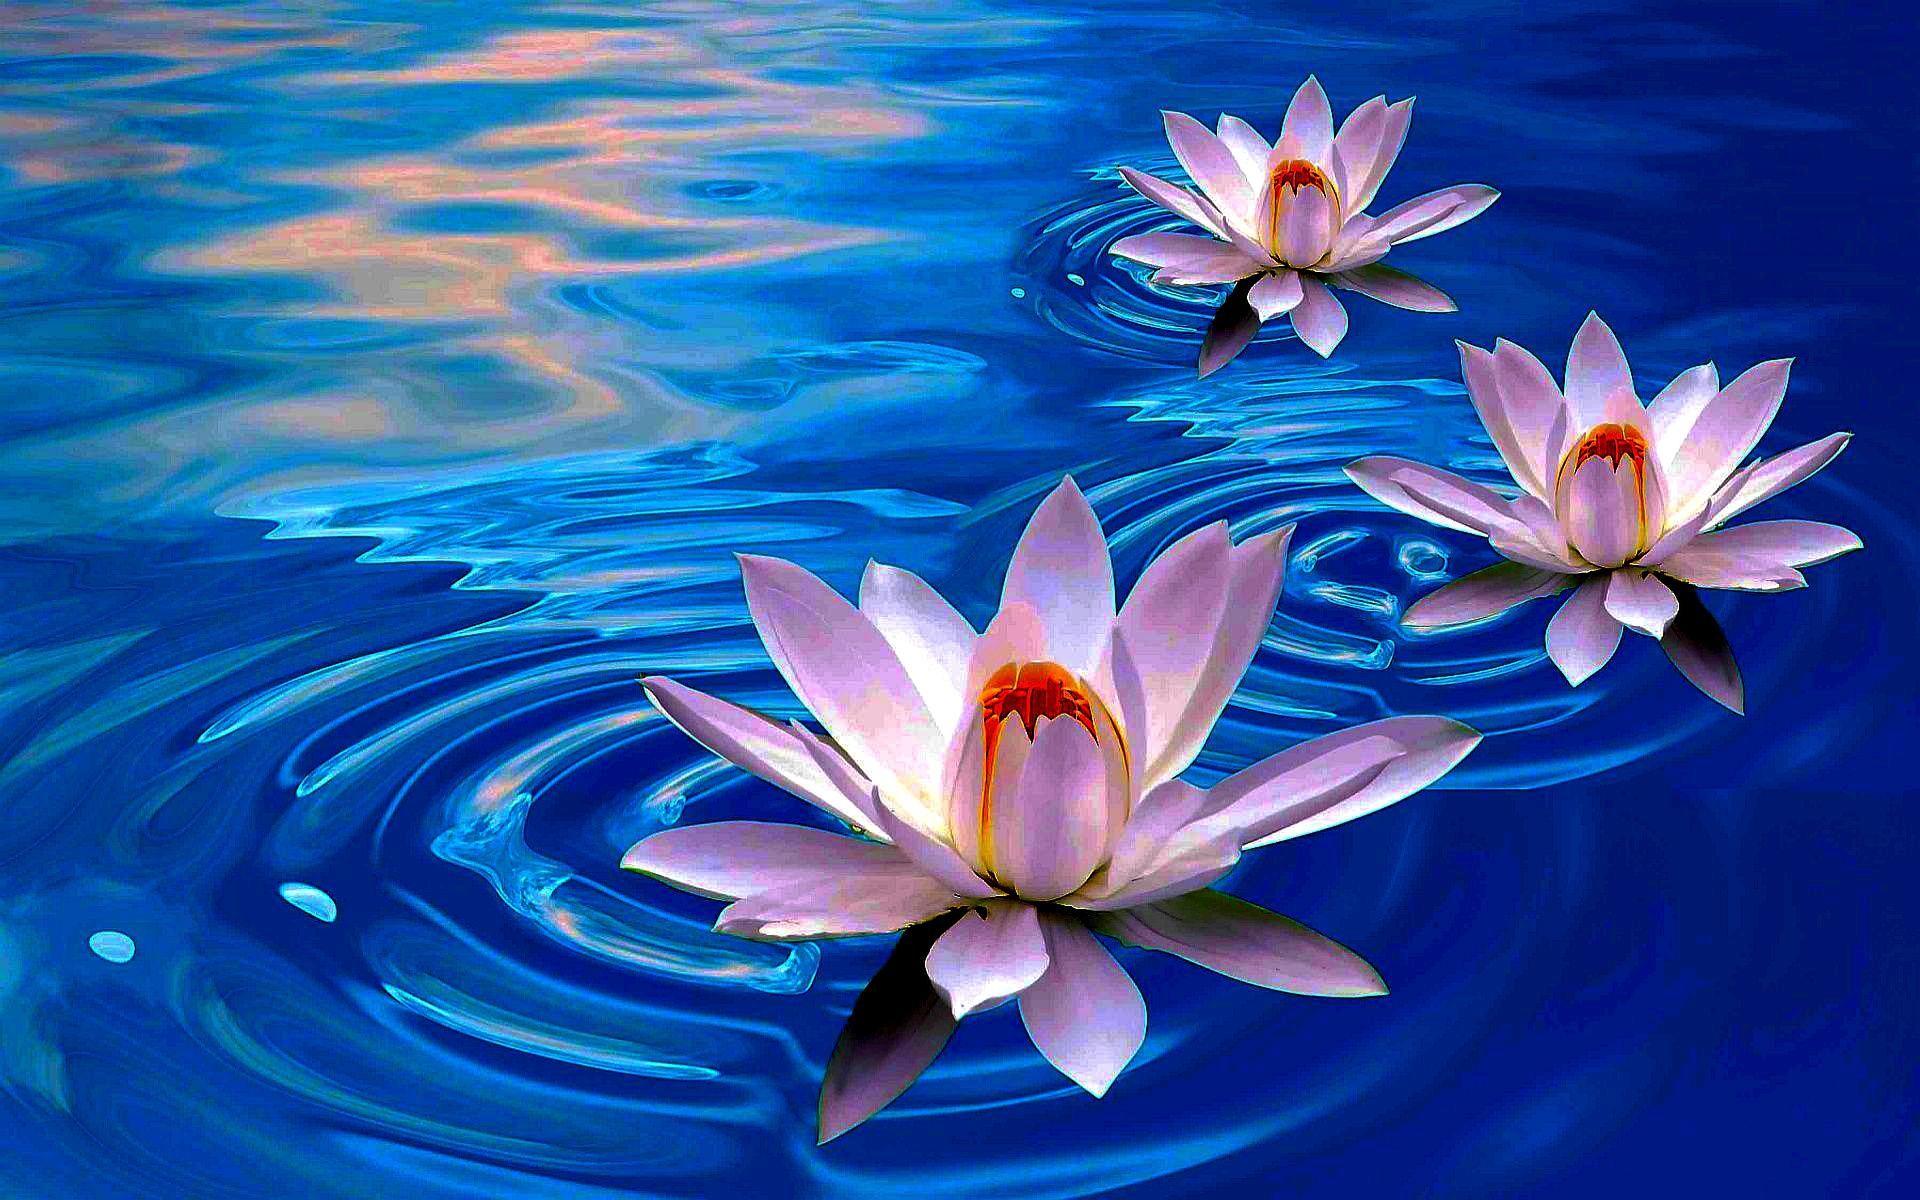 Lotus flower wallpapers nature wallpaper with beautiful white lotus flower mightylinksfo